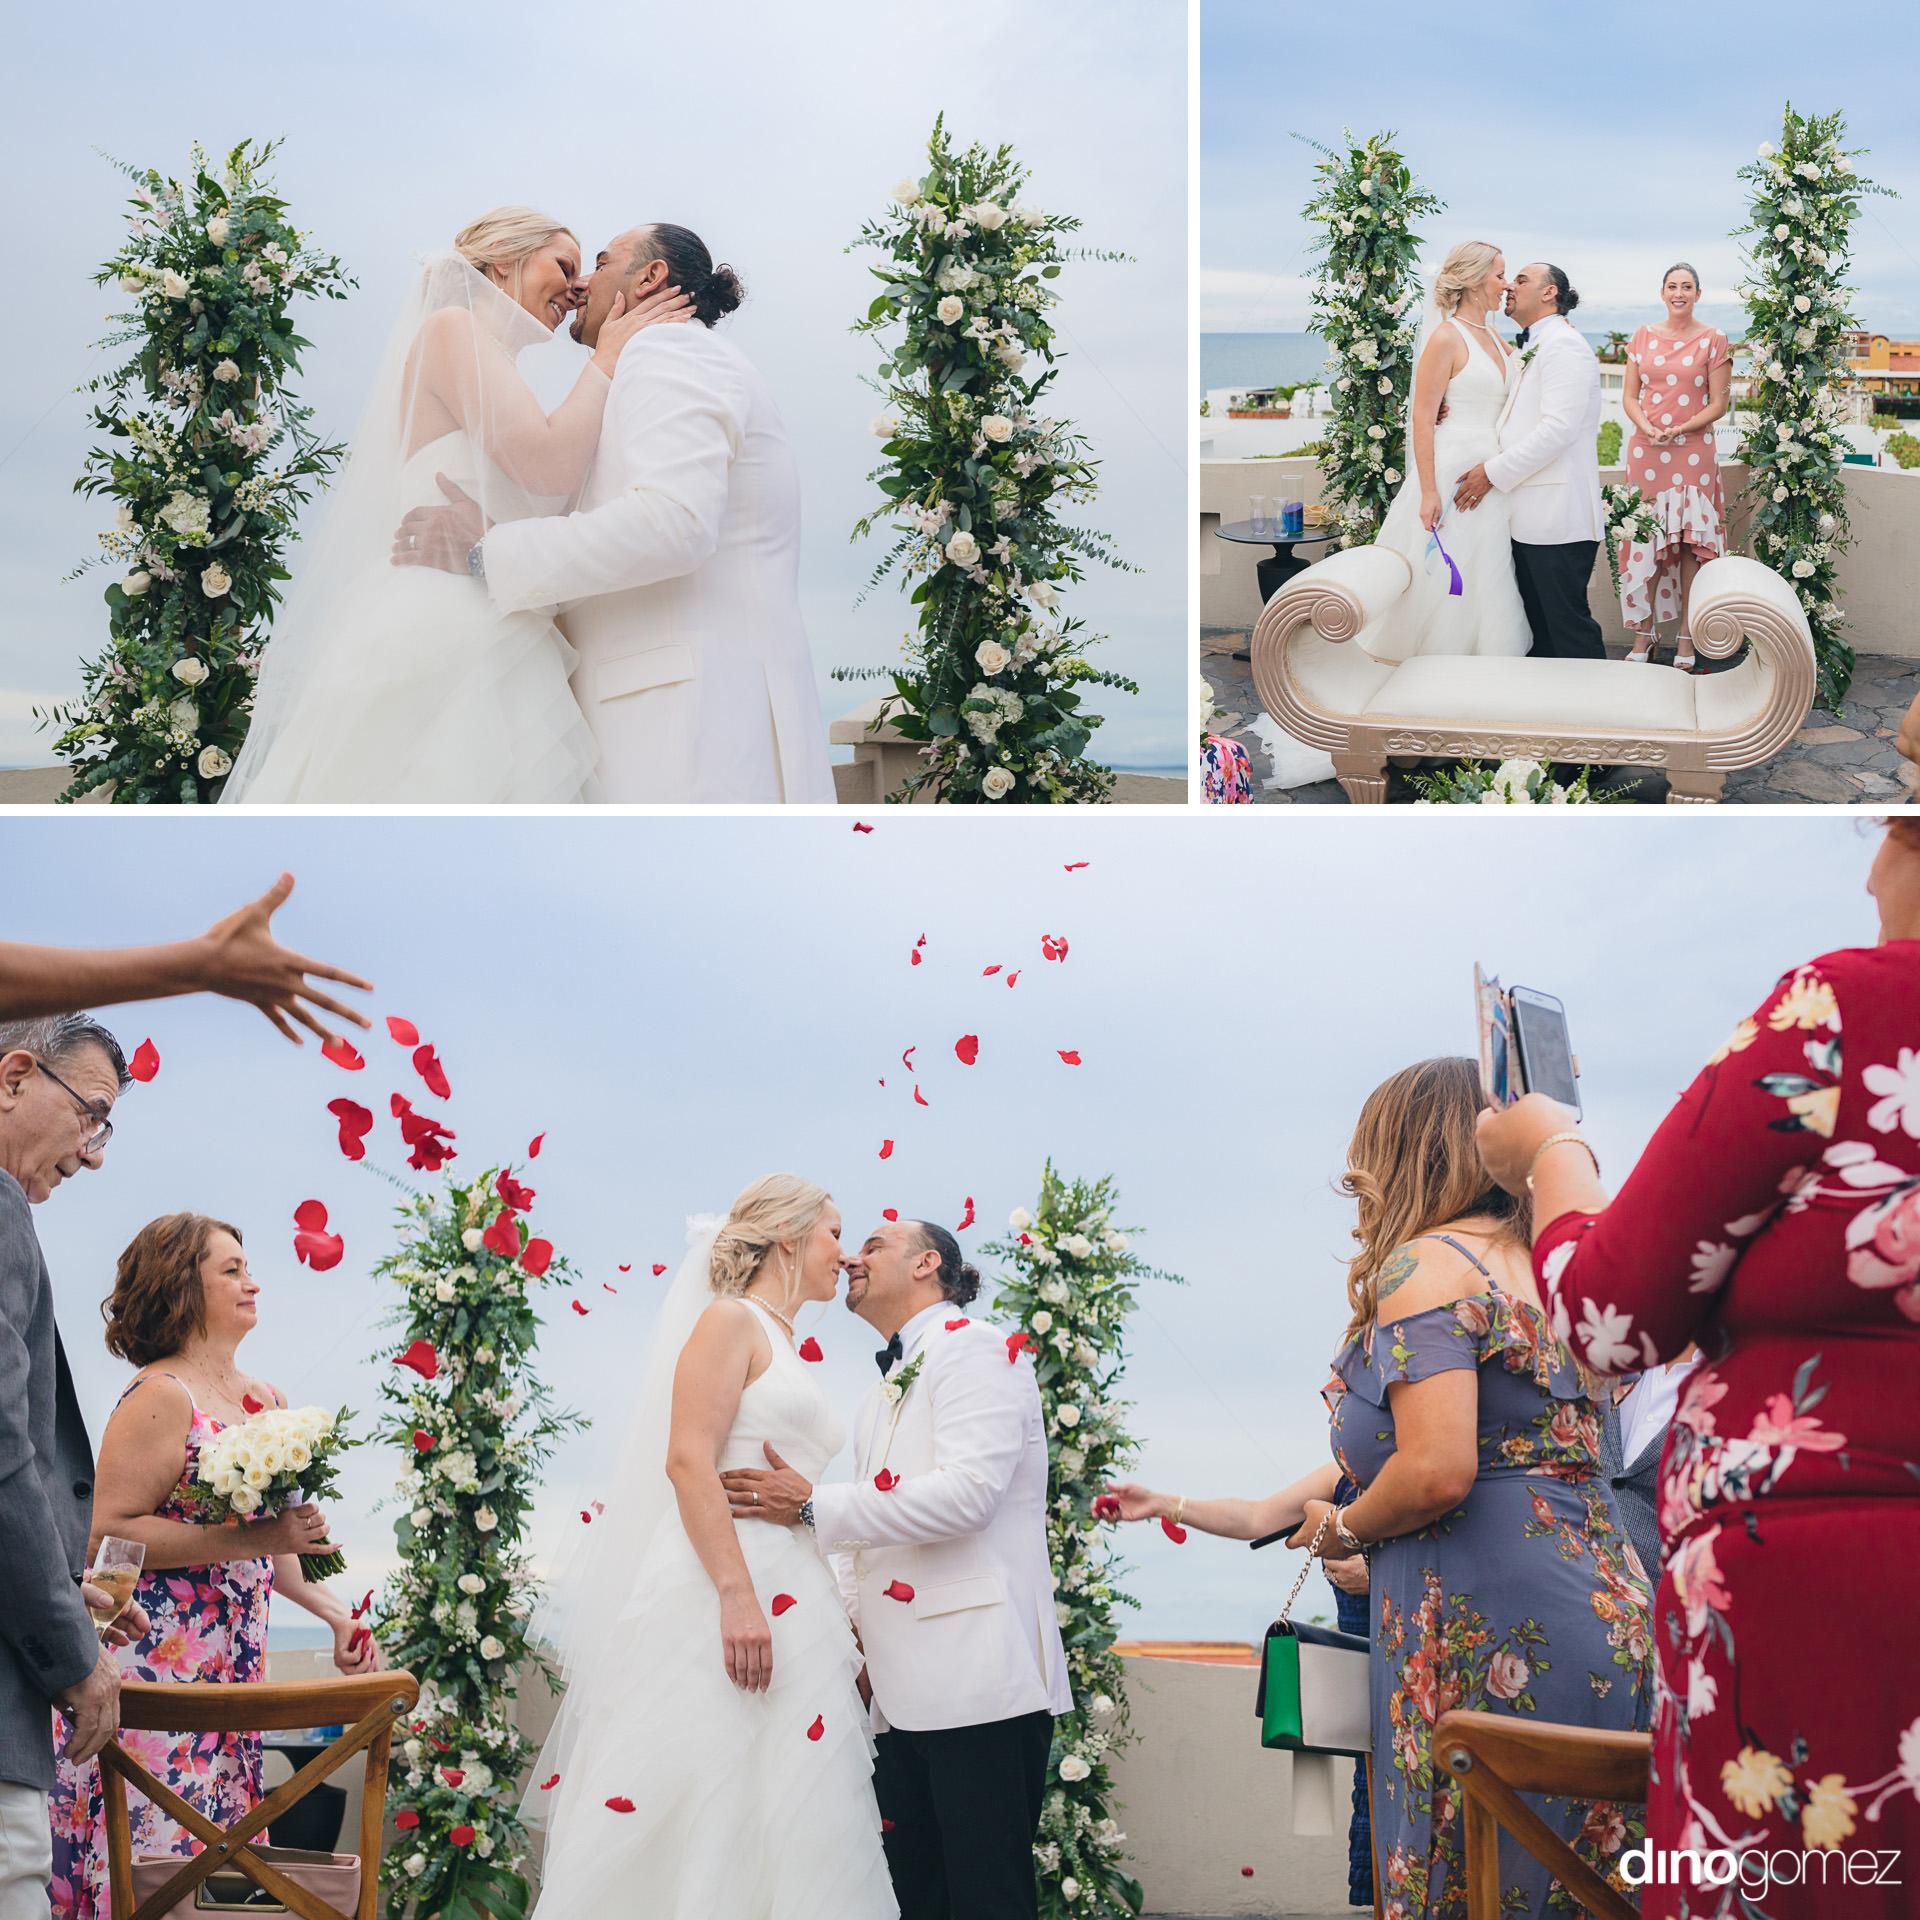 Best Wedding Photographers At Charleston Santa Teresa Hotel Cartagena - St